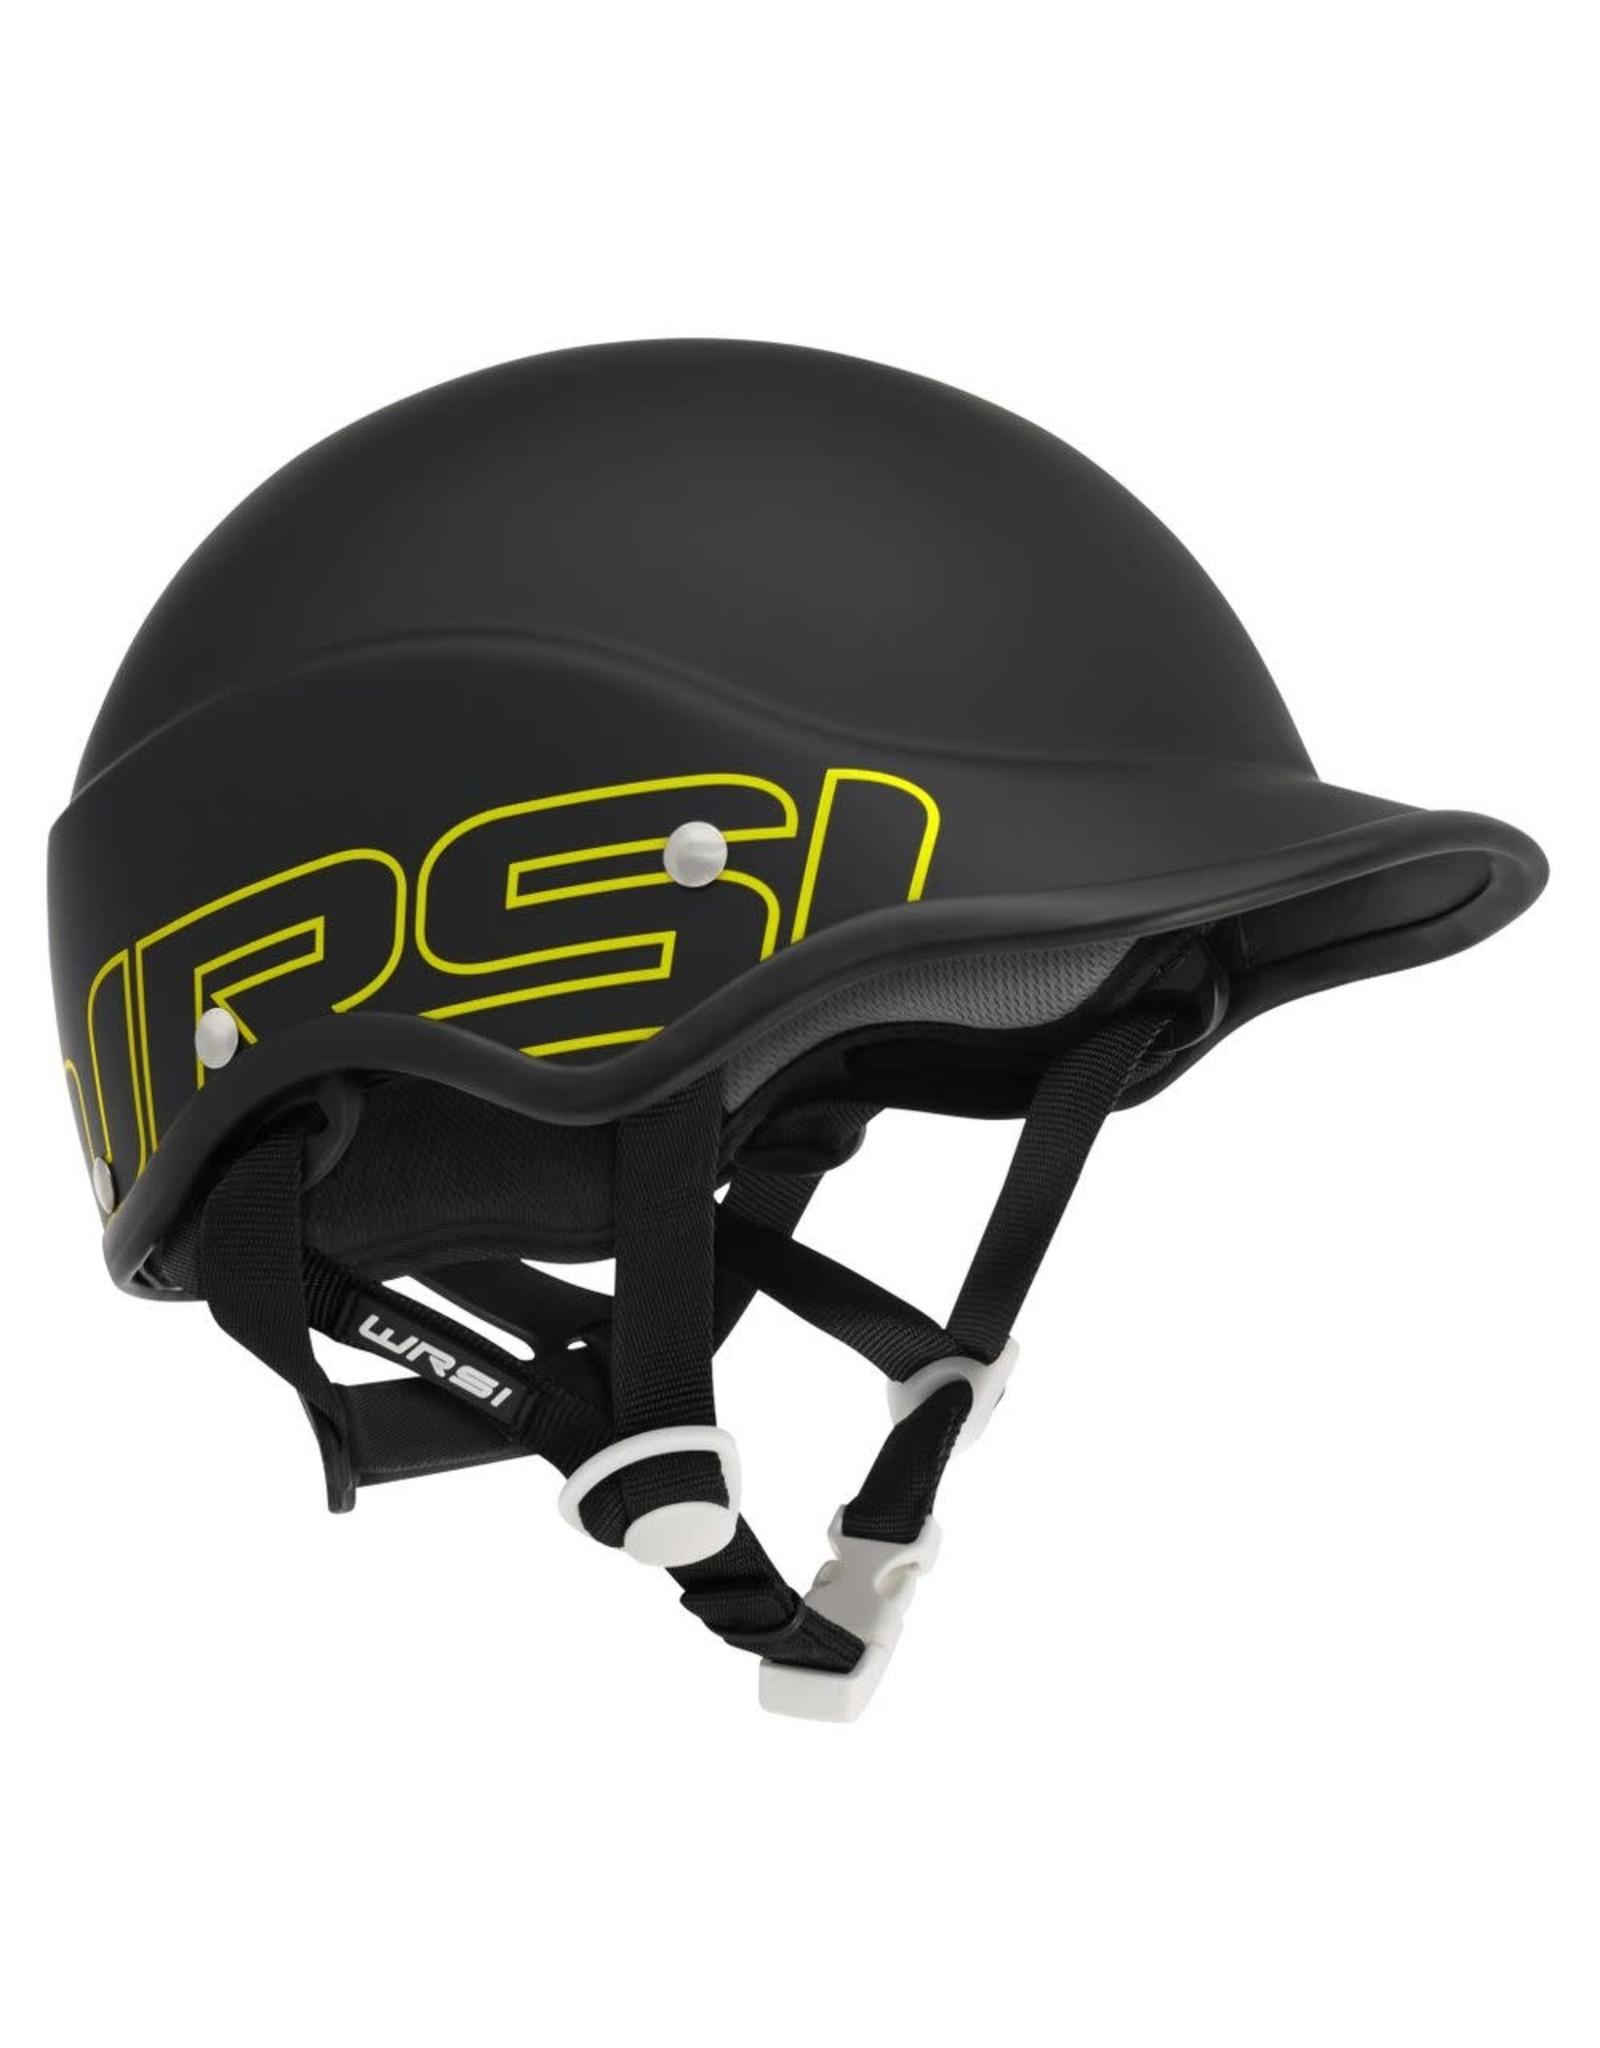 WRSI Trident Composite Helmet (SALE)